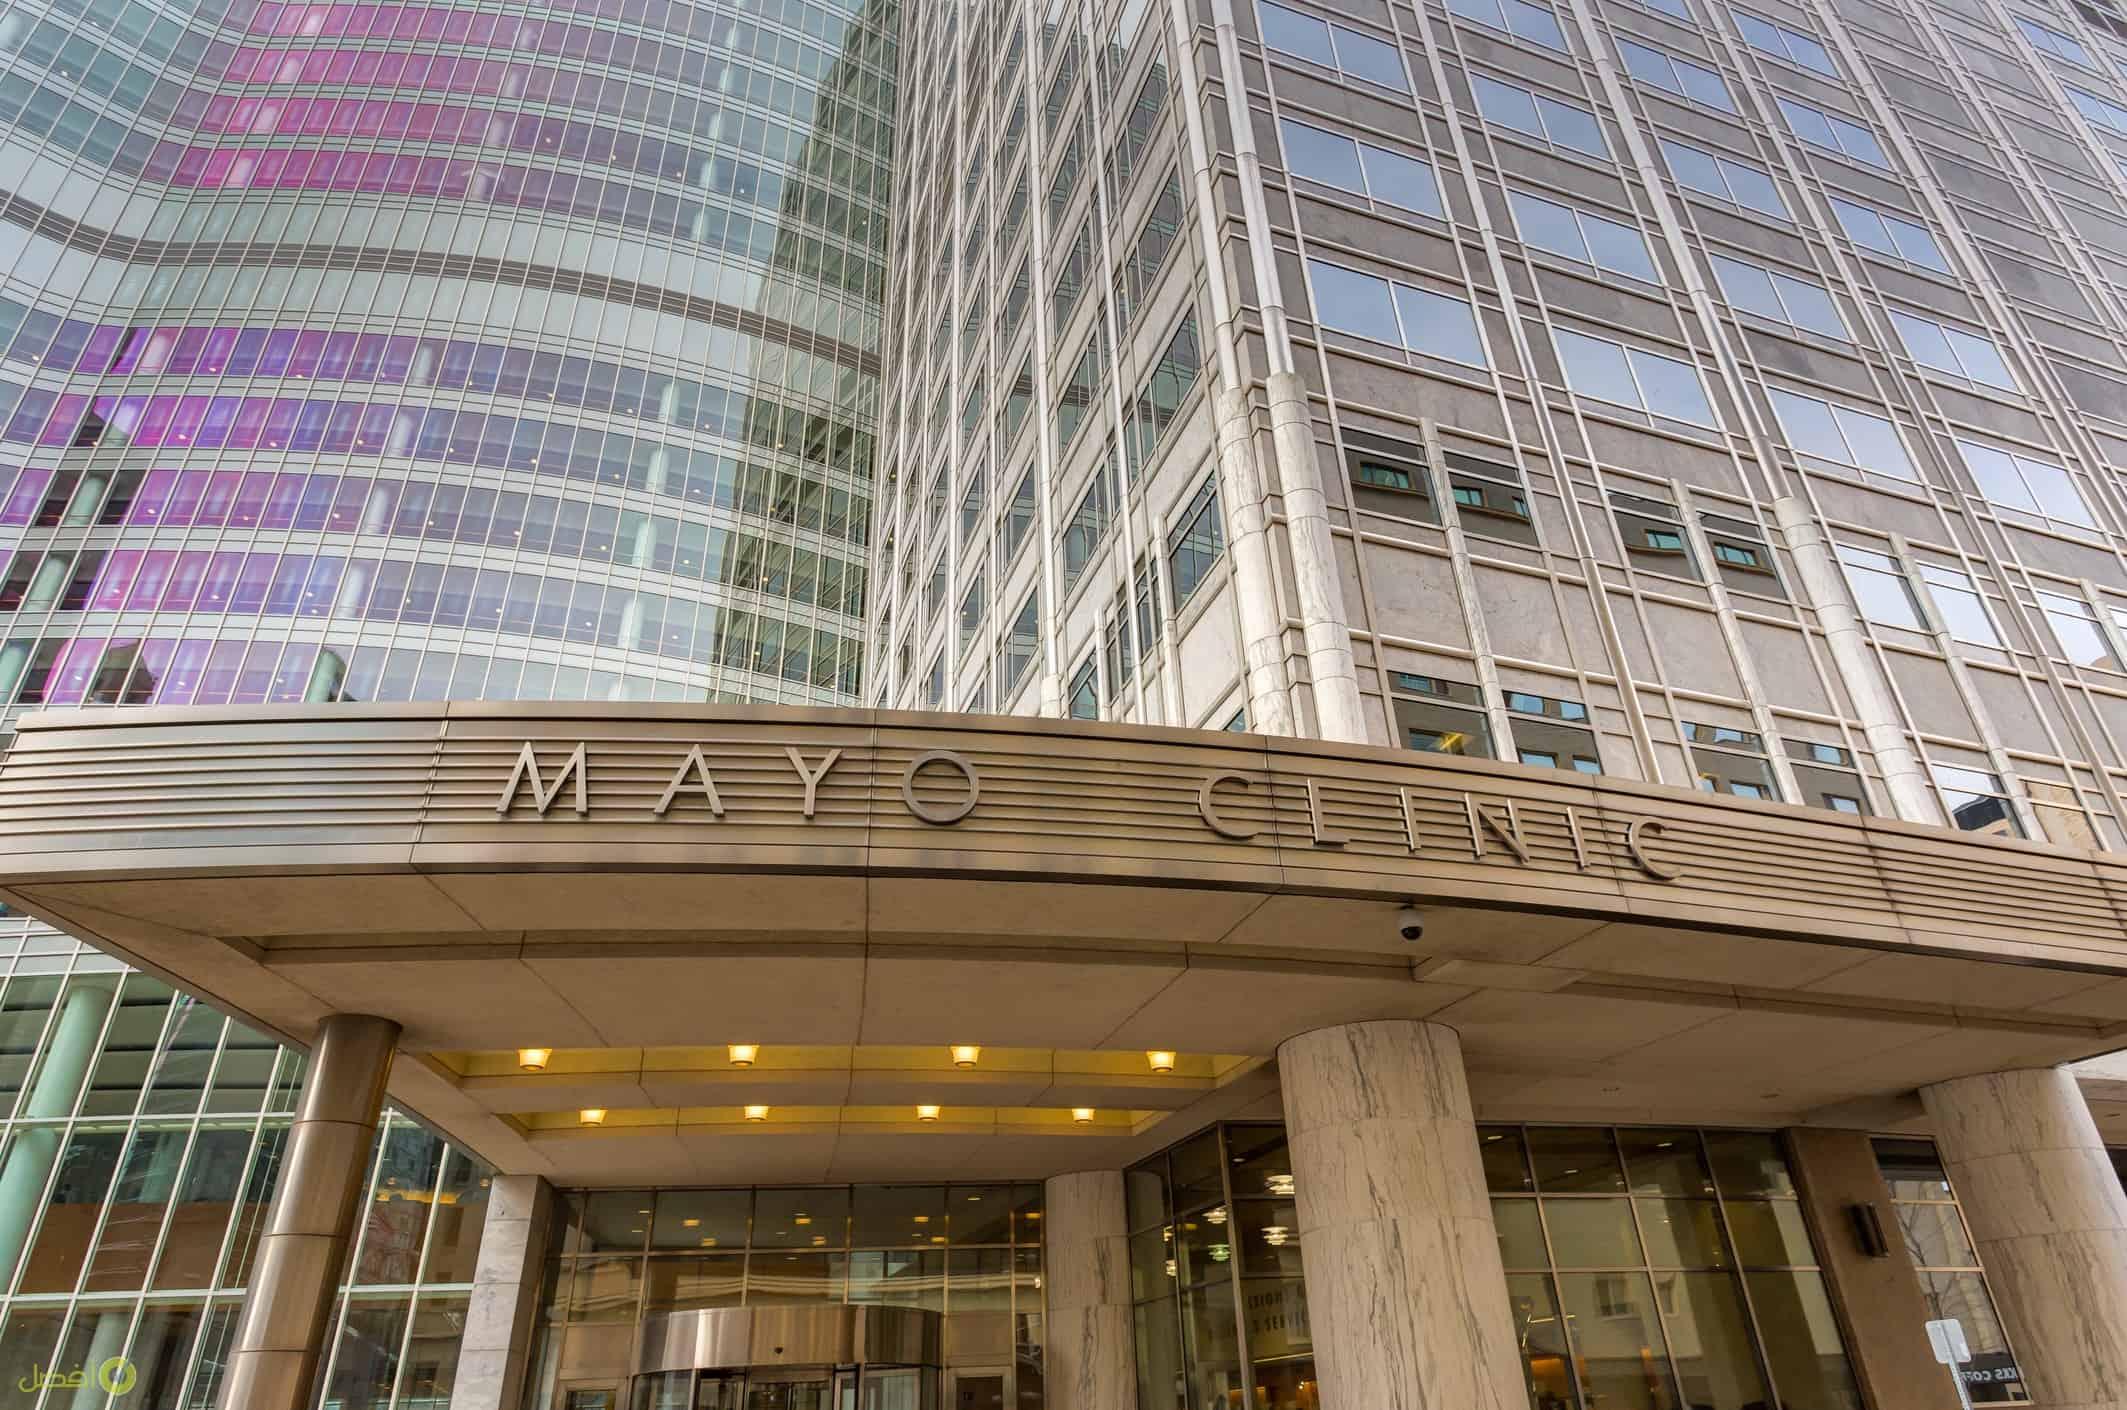 مايو كلينيك Mayo Clinic